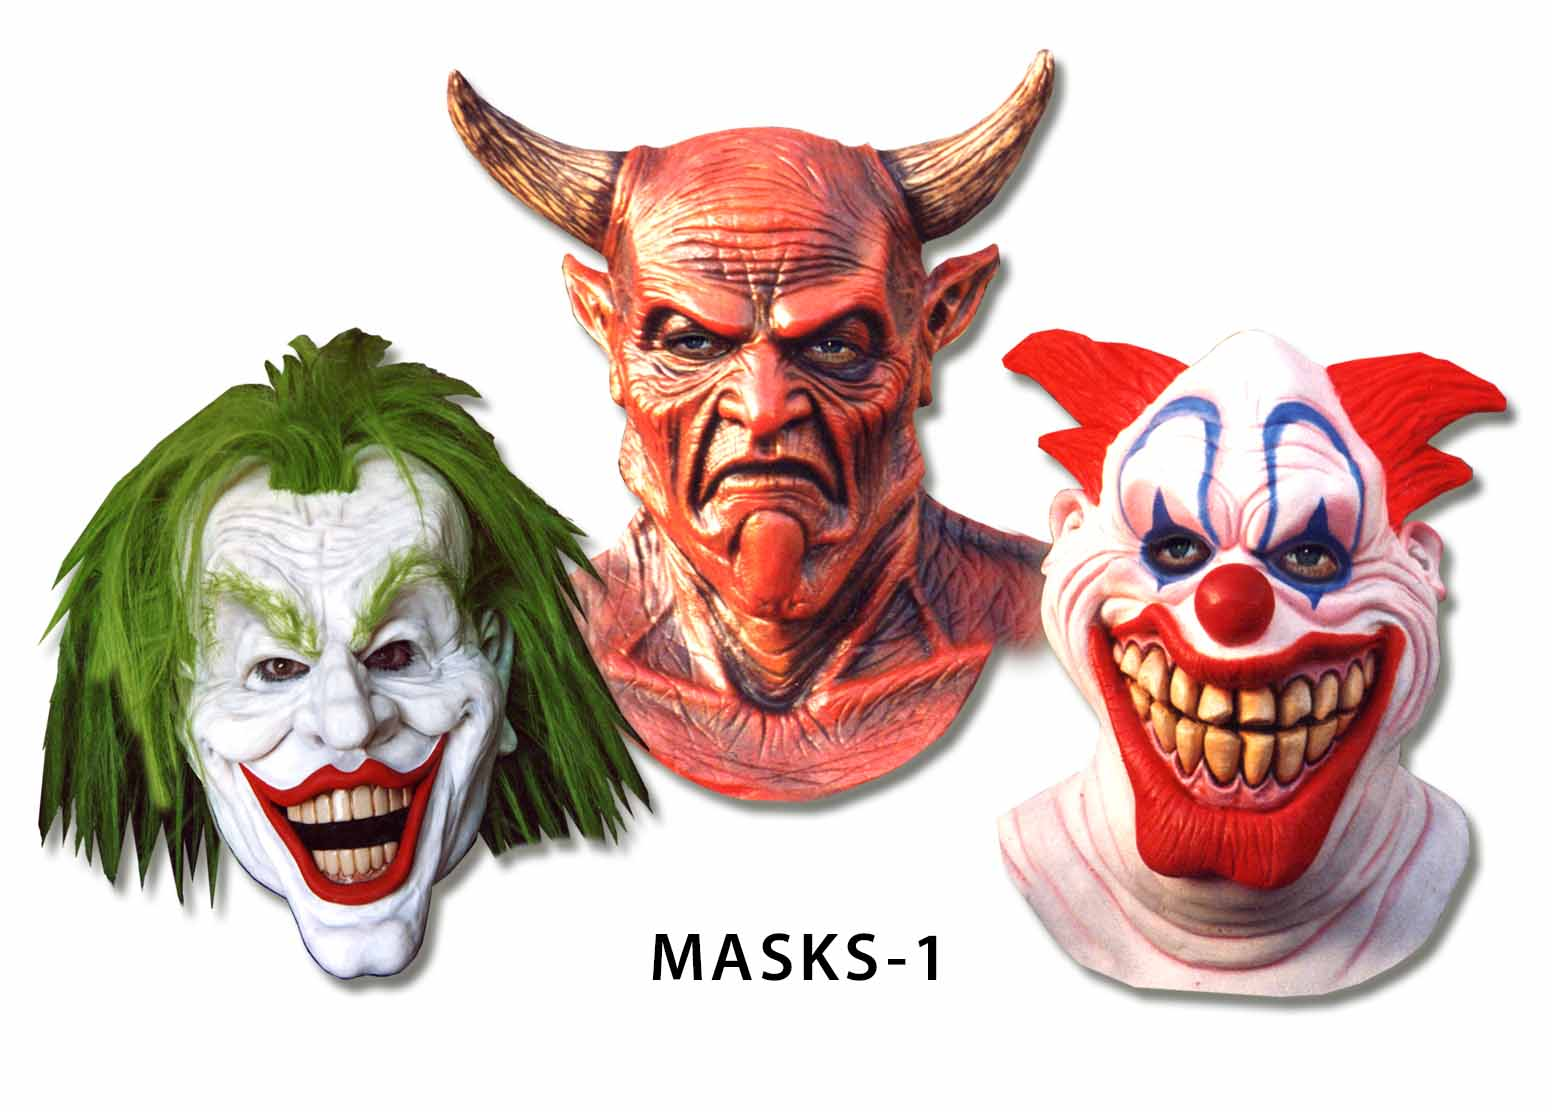 https://0201.nccdn.net/1_2/000/000/163/3f5/SpEfx_Masks_web_1.jpg